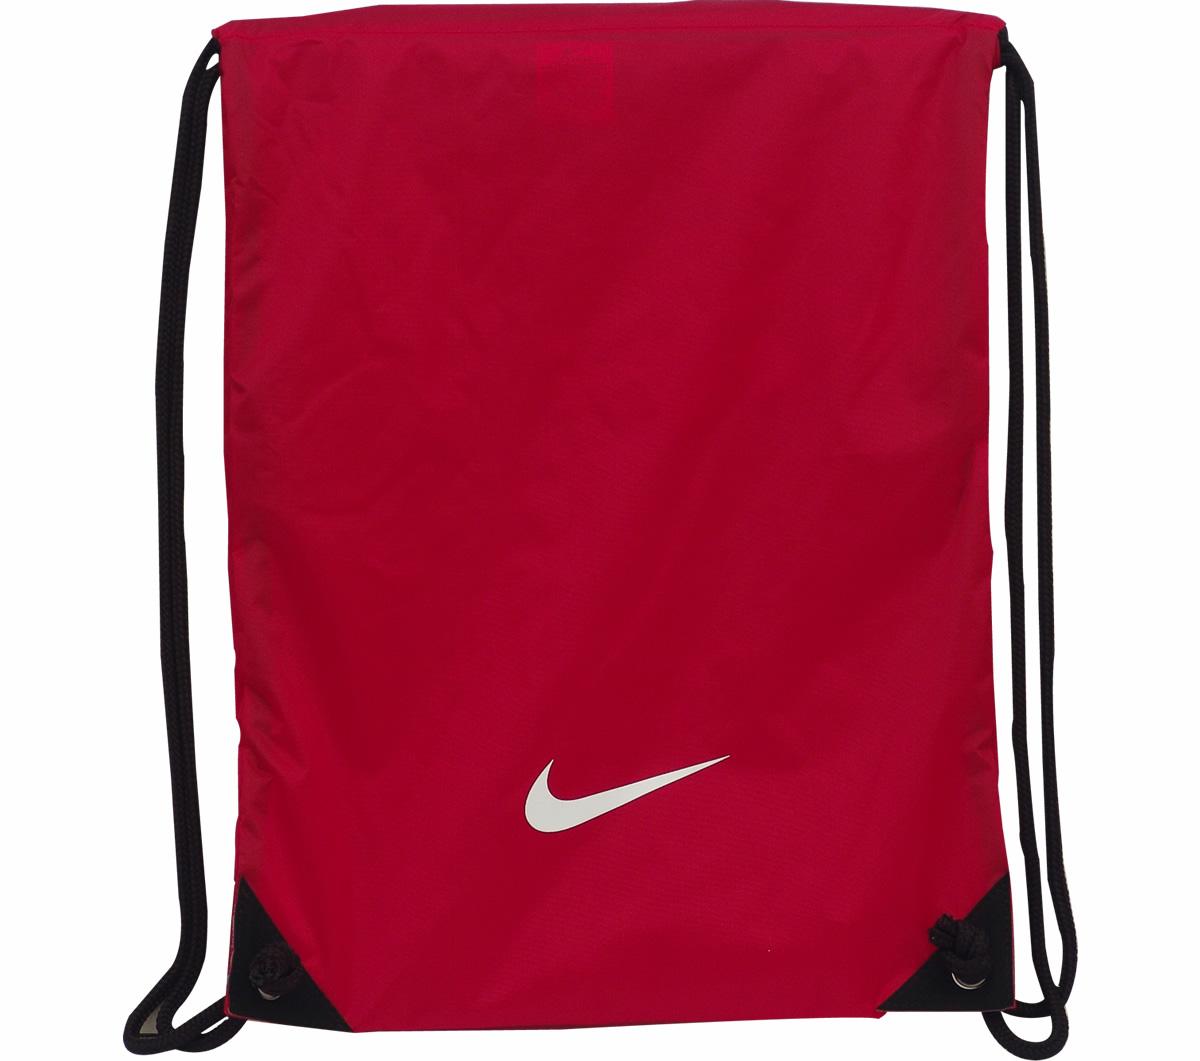 Bolsa Nike Vermelha Feminina : Bolsa gymsack nike fundamentals swoosh vermelha mundo do